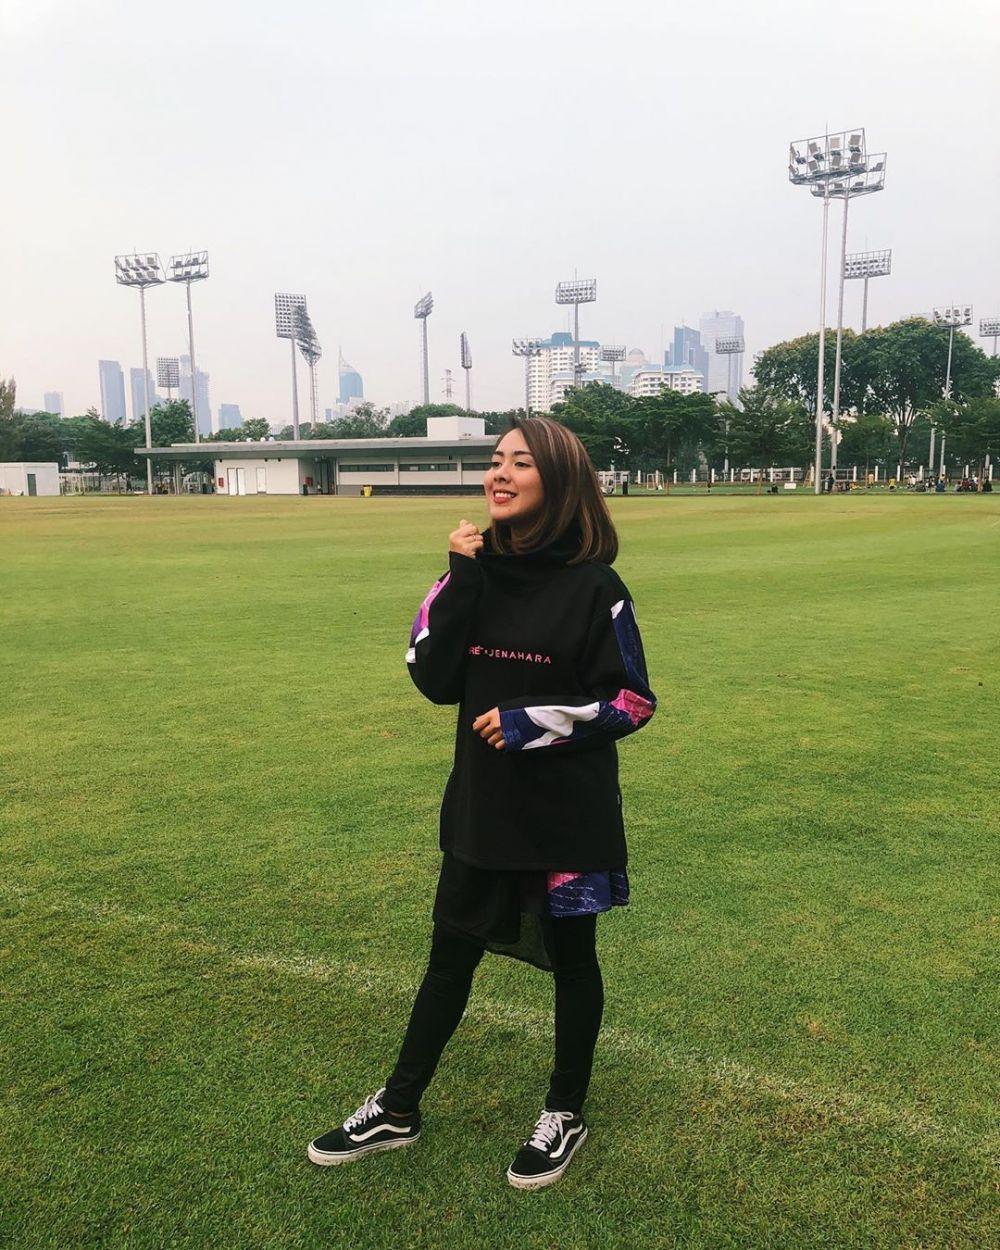 8 Pesona Nabila Faisal, calon istri Marcell Darwin yang cantik Instagram/@fastynabila